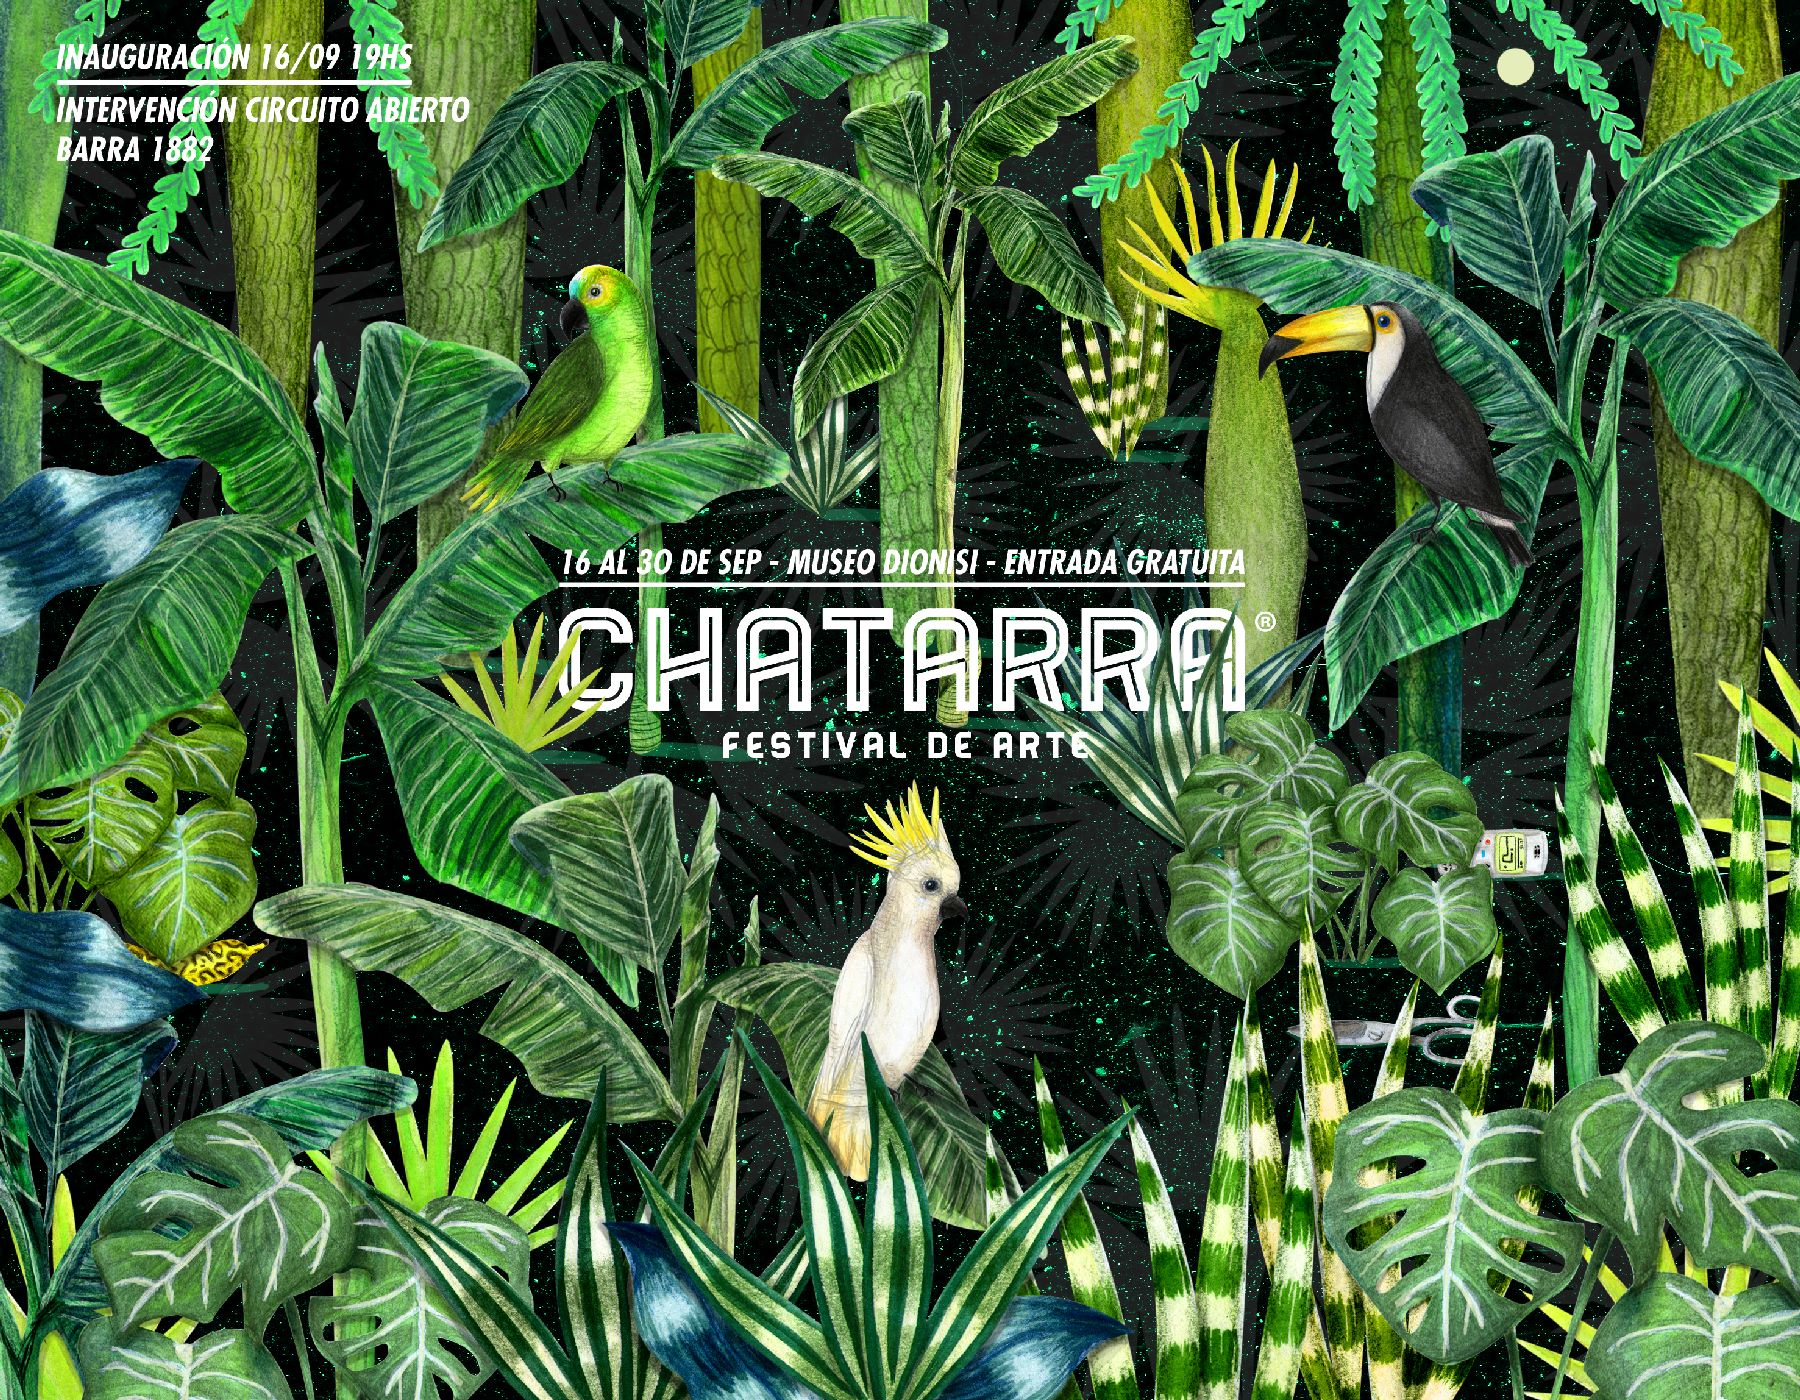 Todo se transforma: llega Chatarra al Museo Dionisi